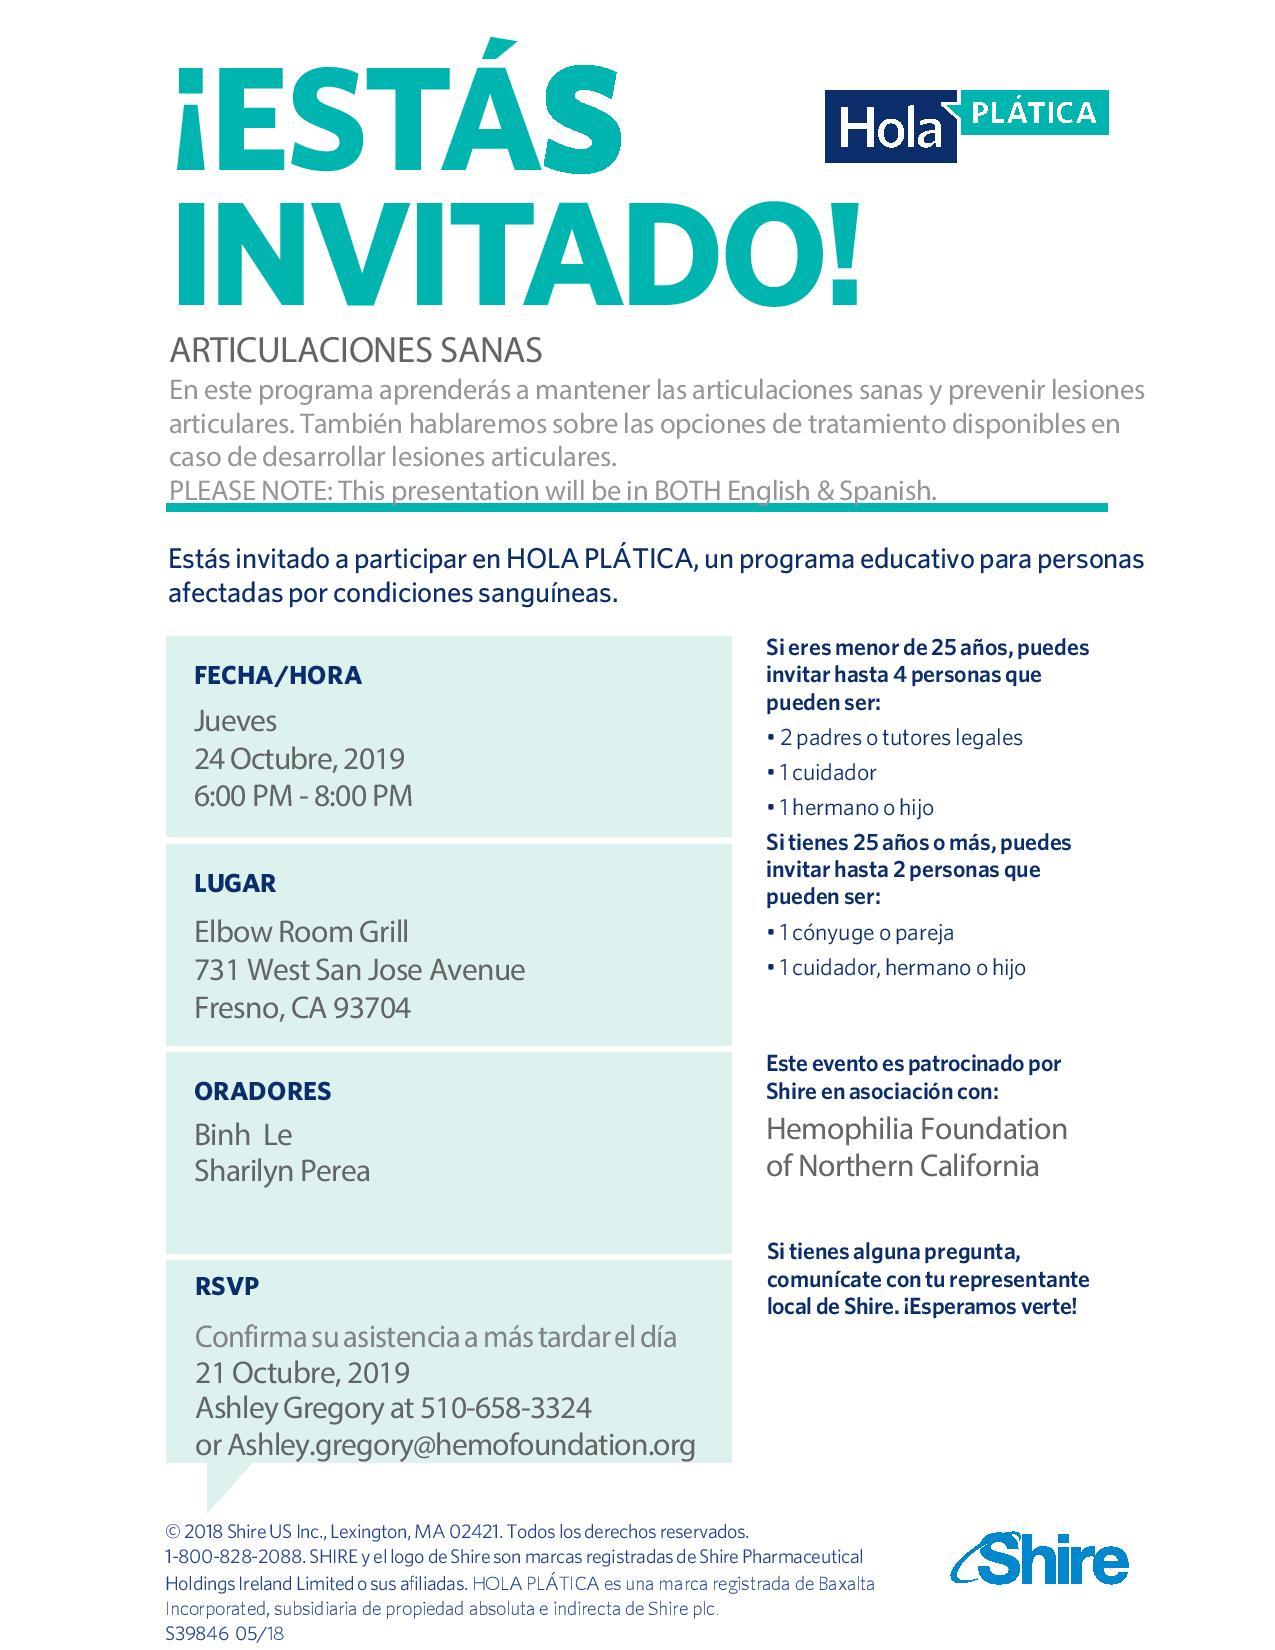 Joint Health Education English/Spanish  Fresno Dinner